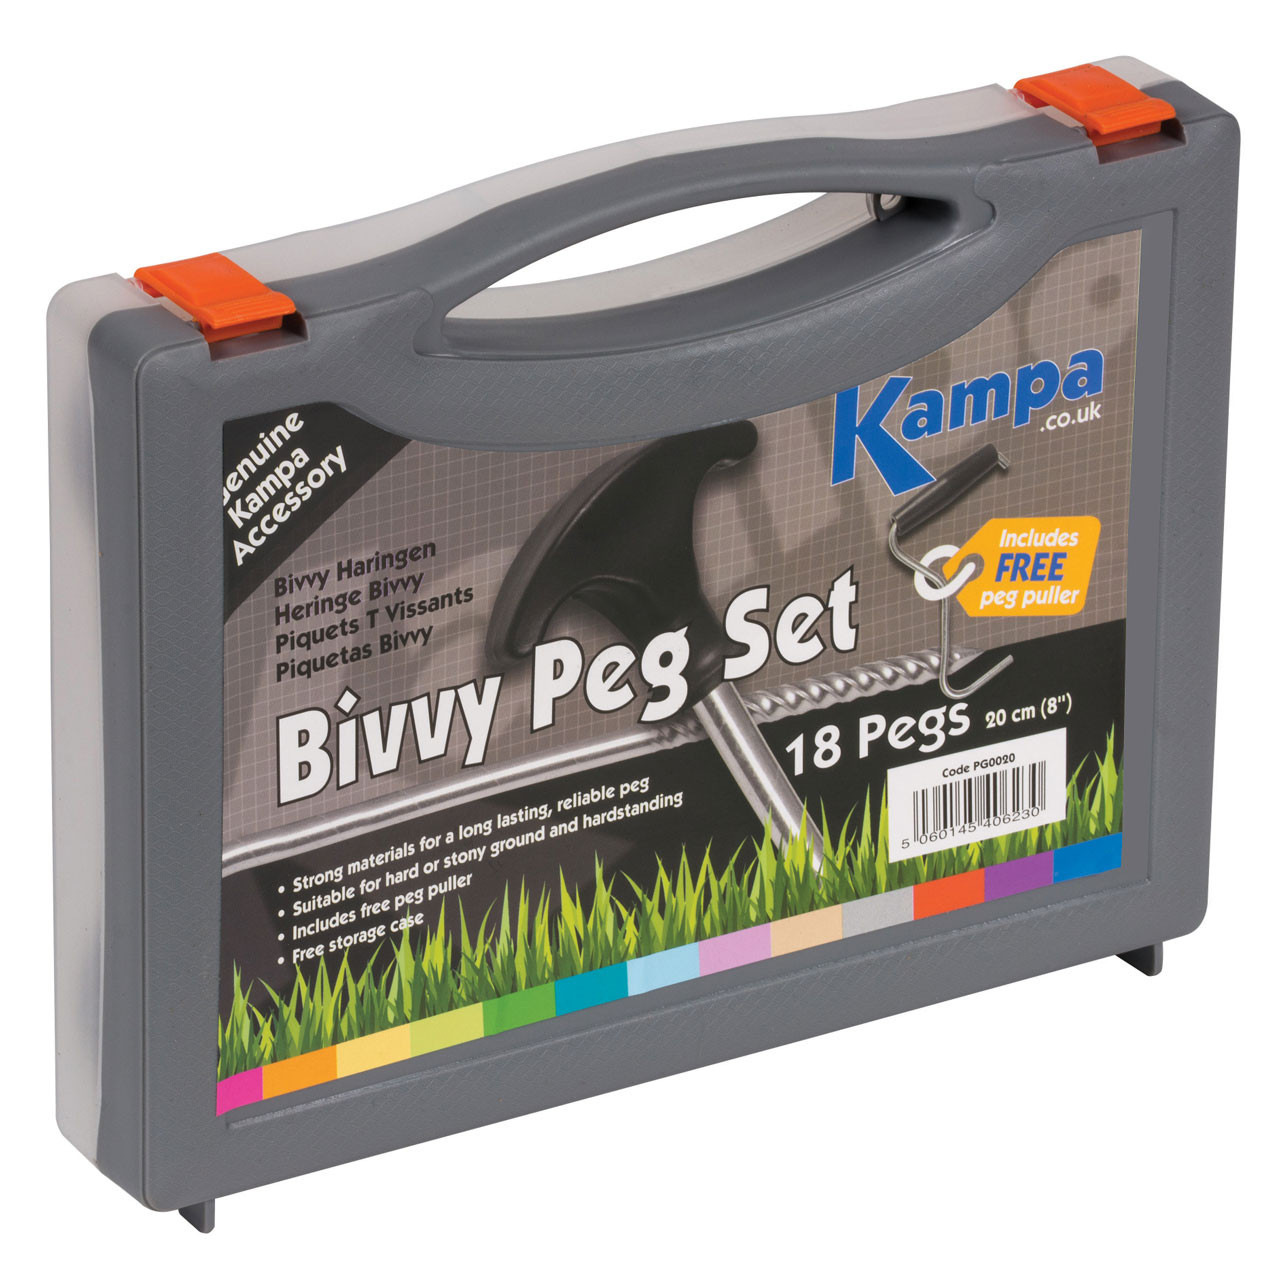 Kampa Bivvy Peg Pack